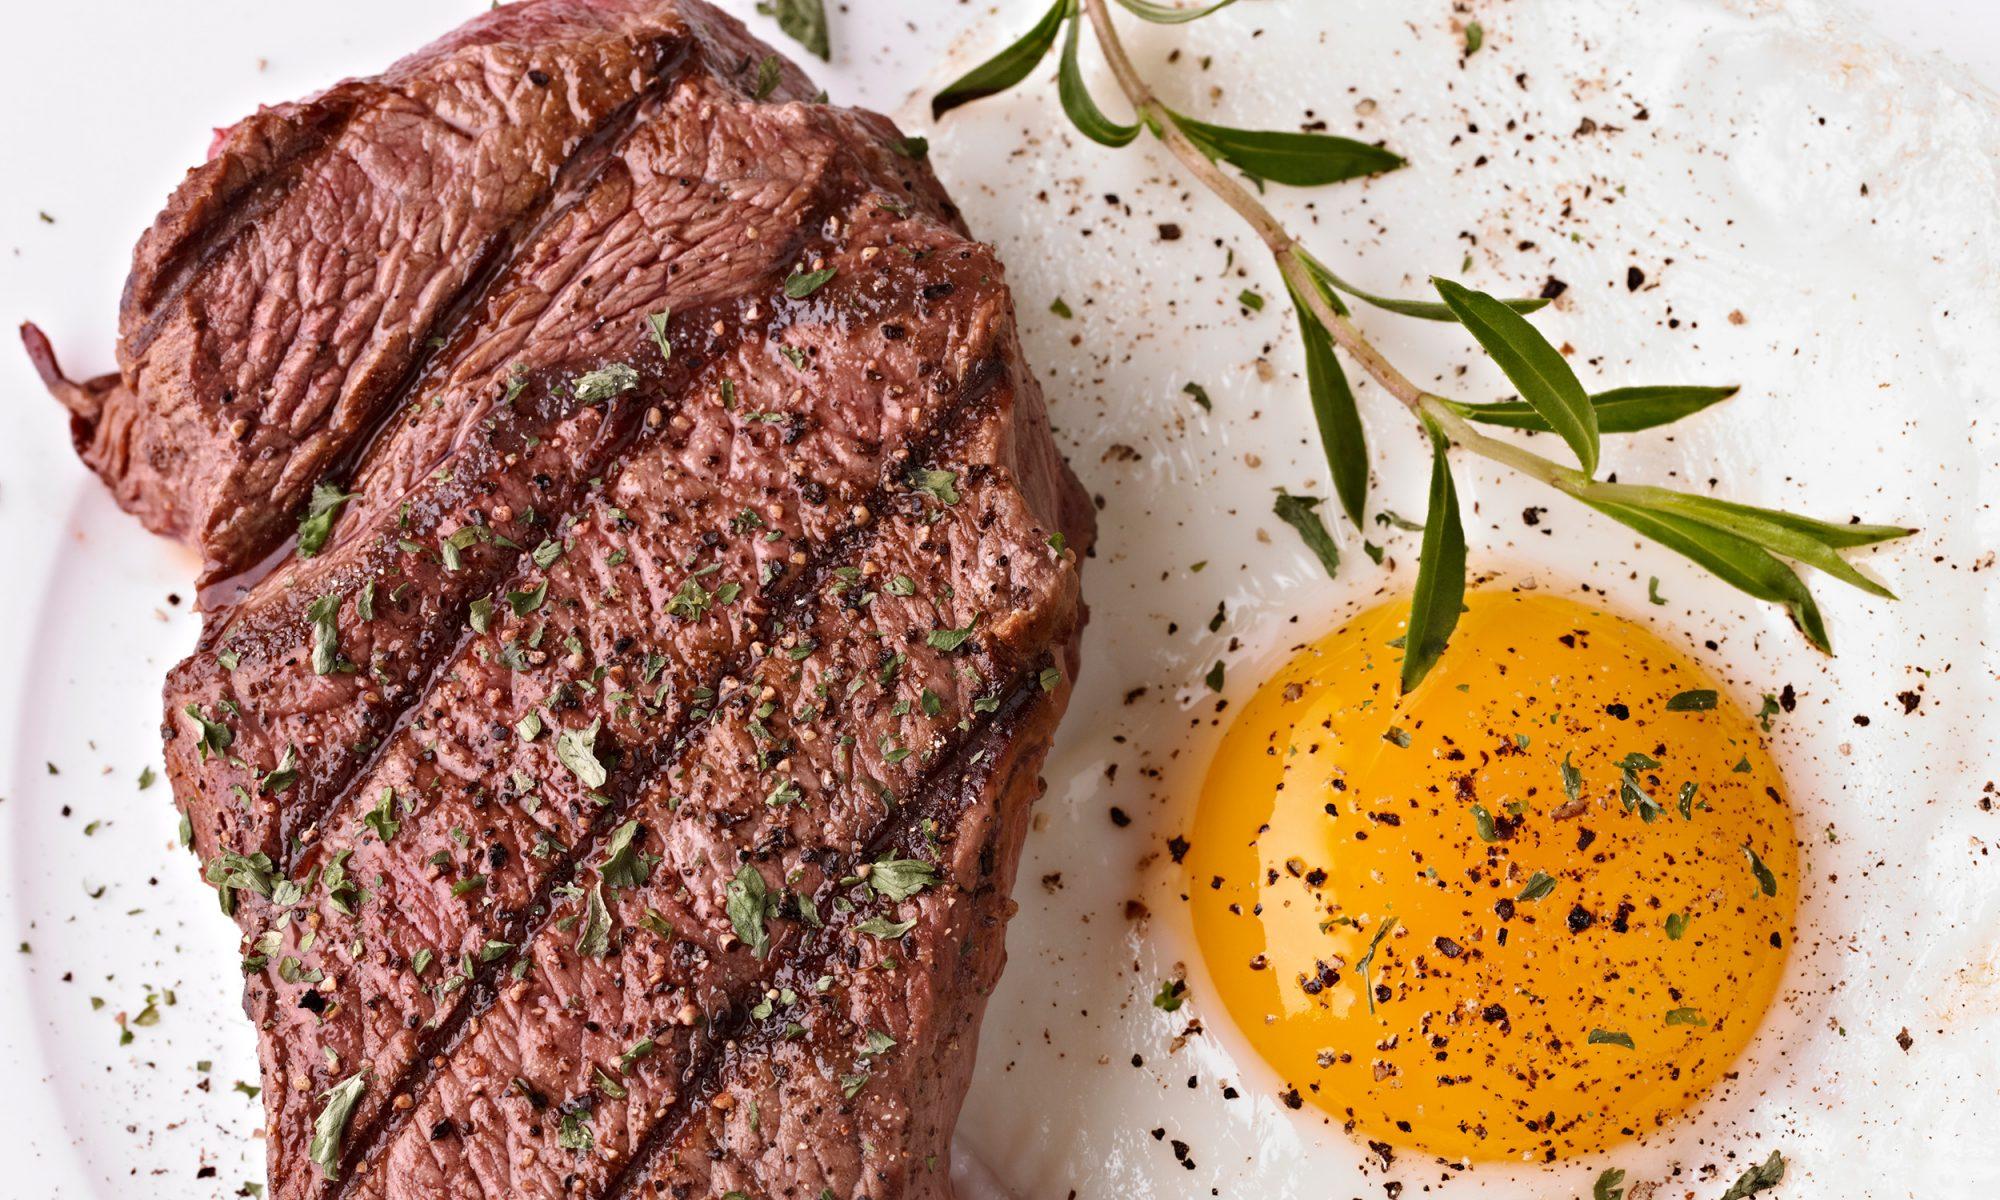 EC: Bring Back the Breakfast Steak